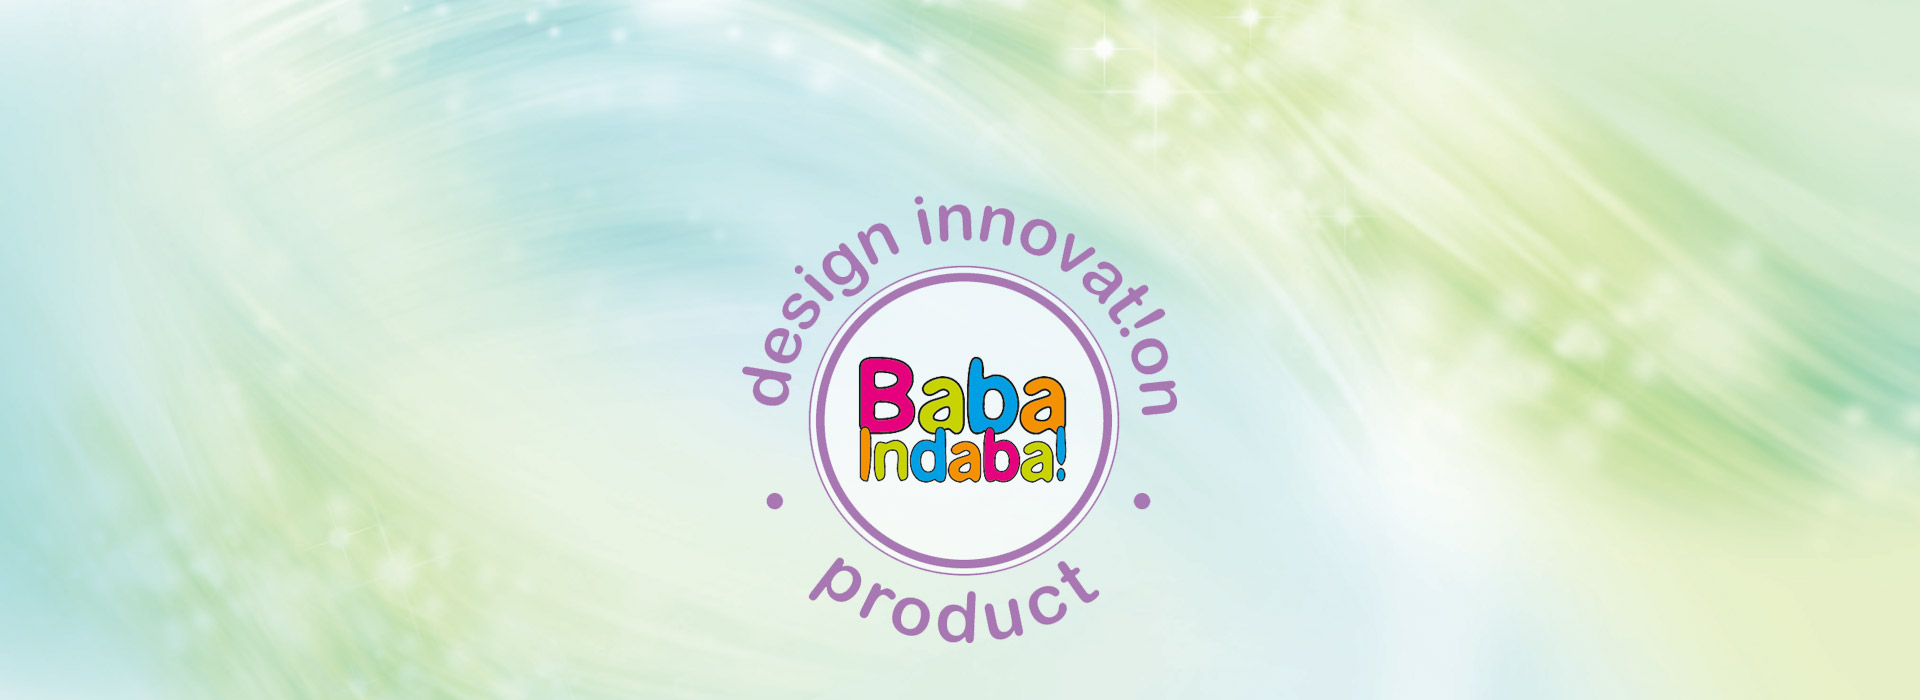 Design-Innovation-Baby-Indaba